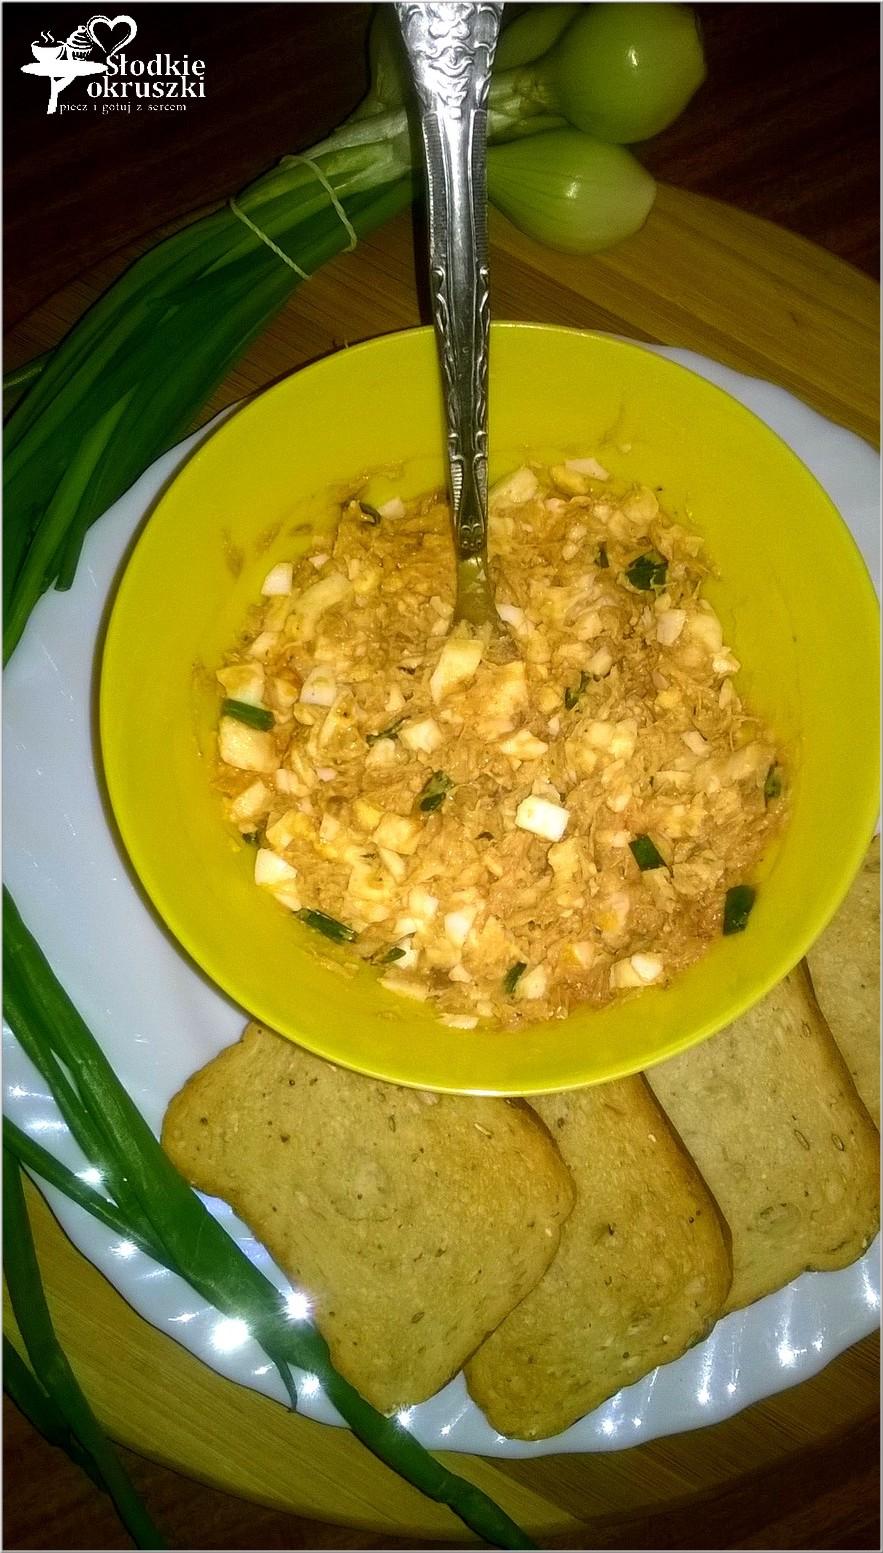 pomidorowa-pasta-z-makreli-1